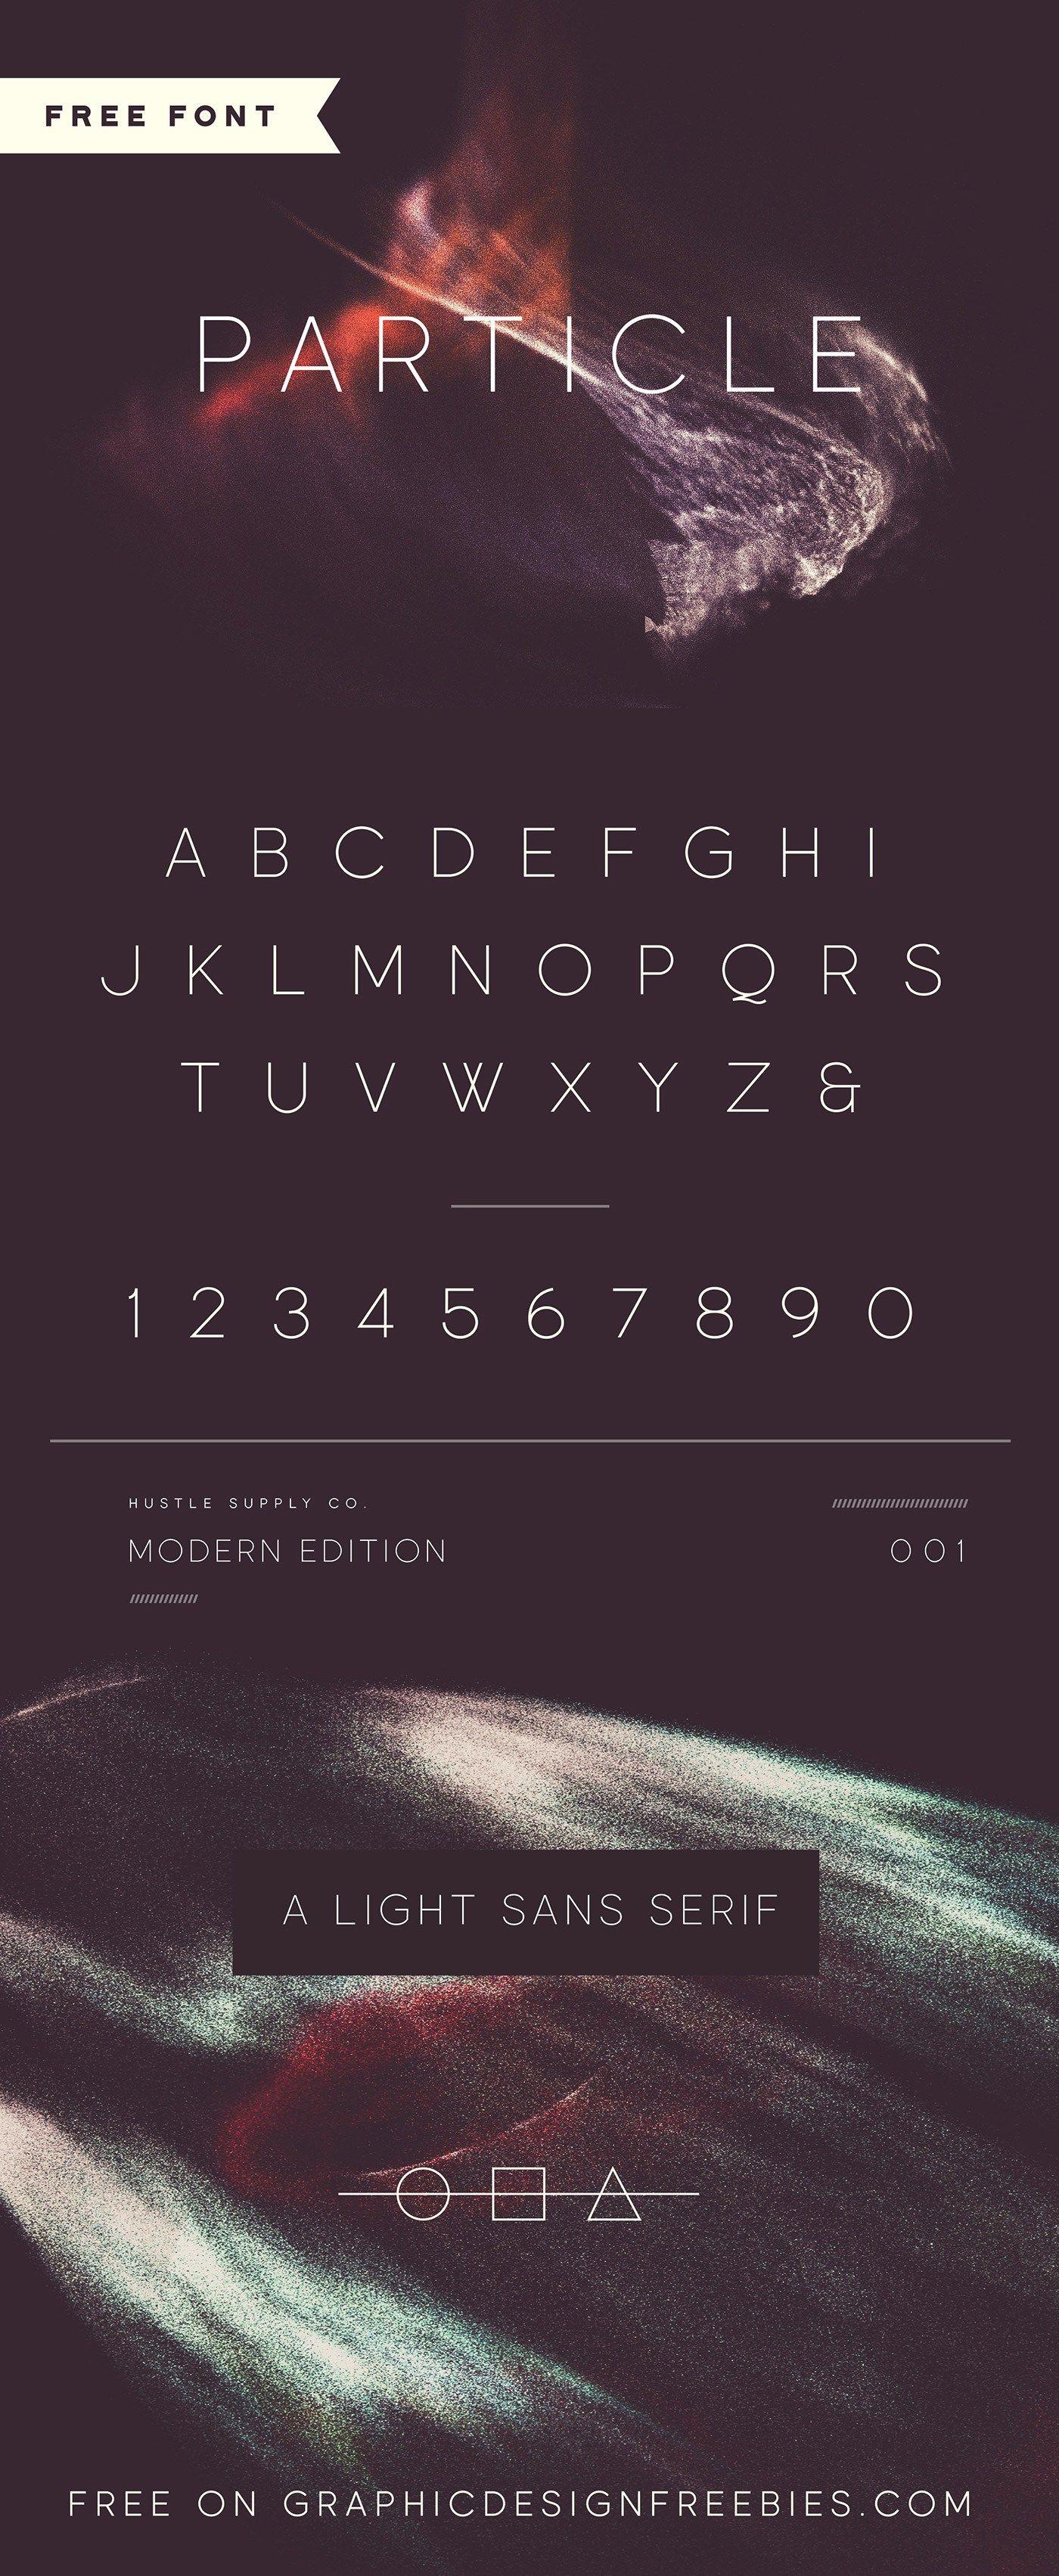 Particle Free Font By Jeremy Vessey Font Freebie Graphic Design Freebies Graphic Design Fonts Design Freebie